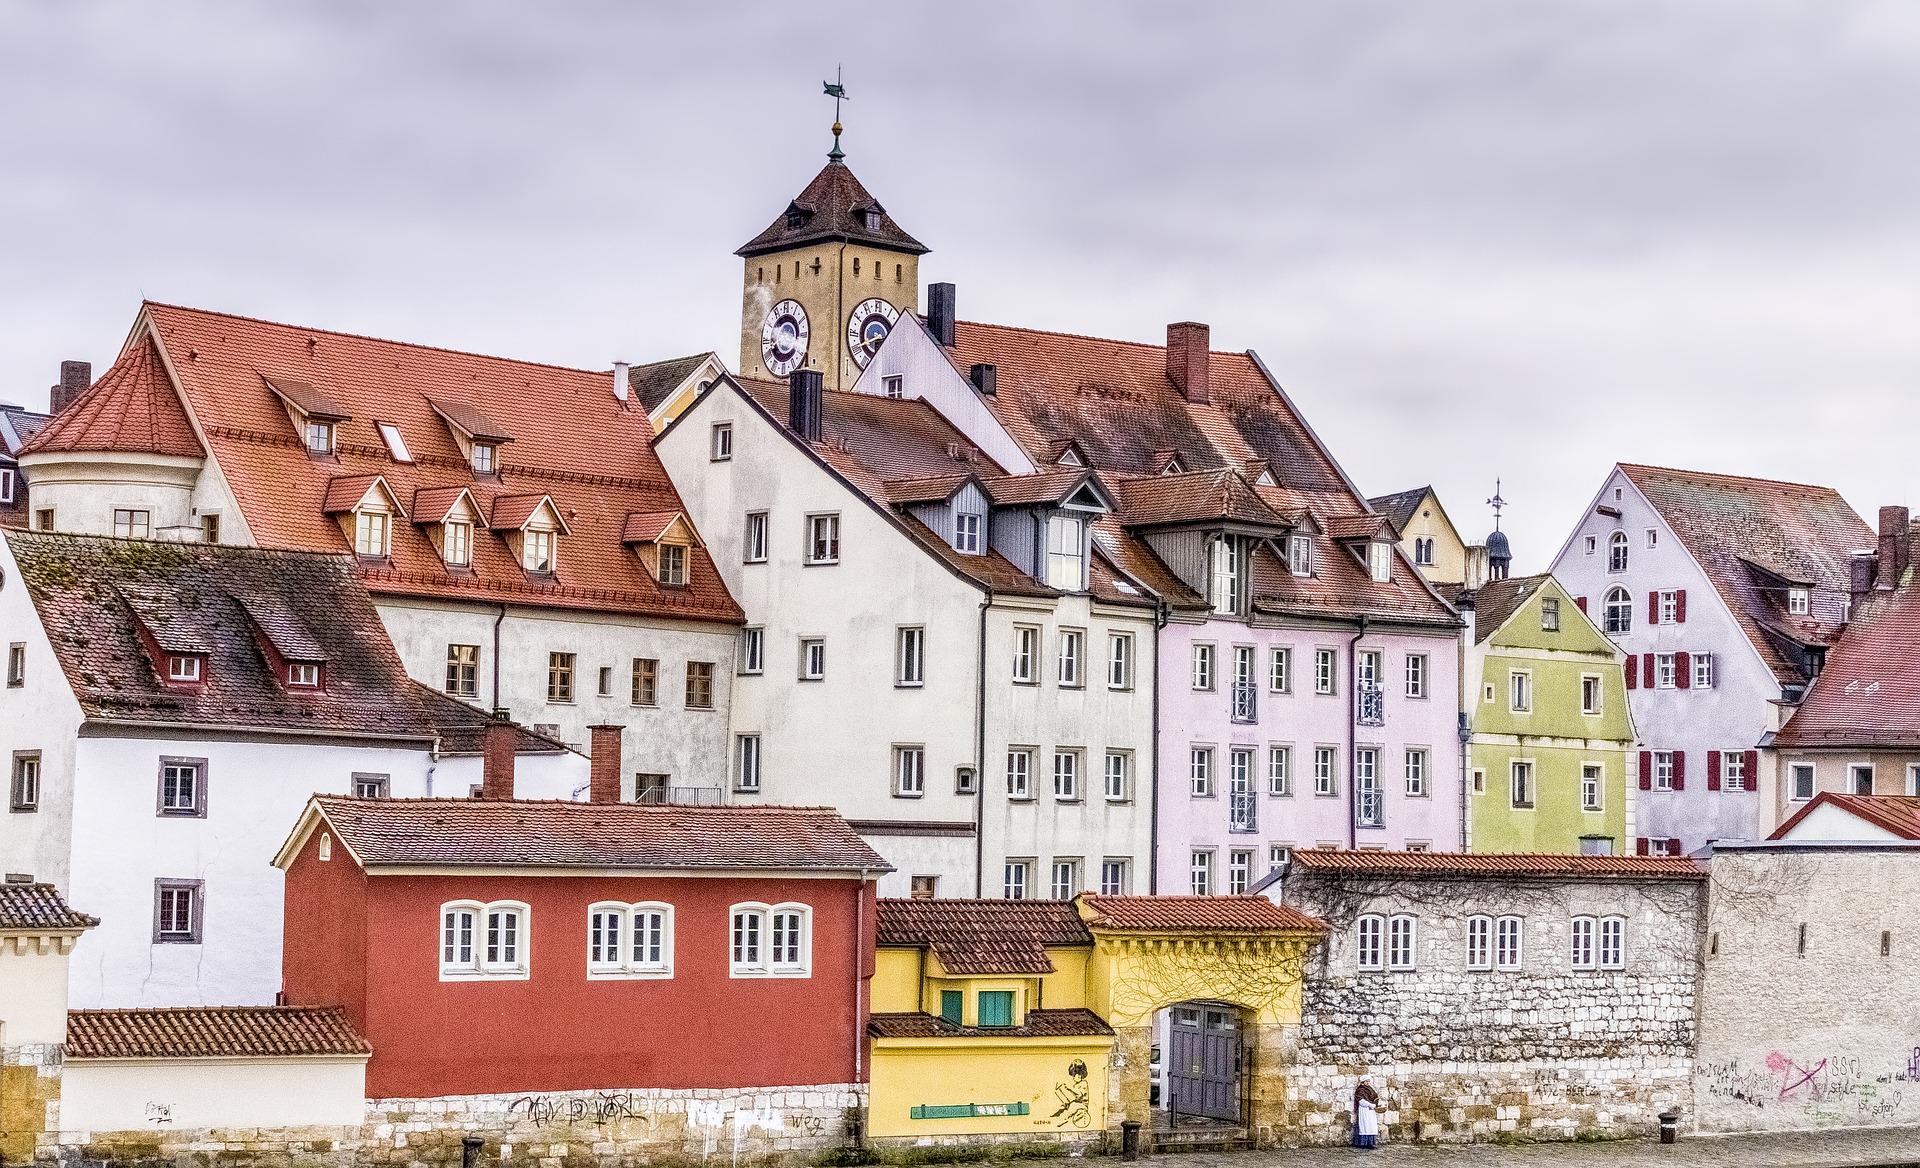 Germania Inkasso In Regensburg